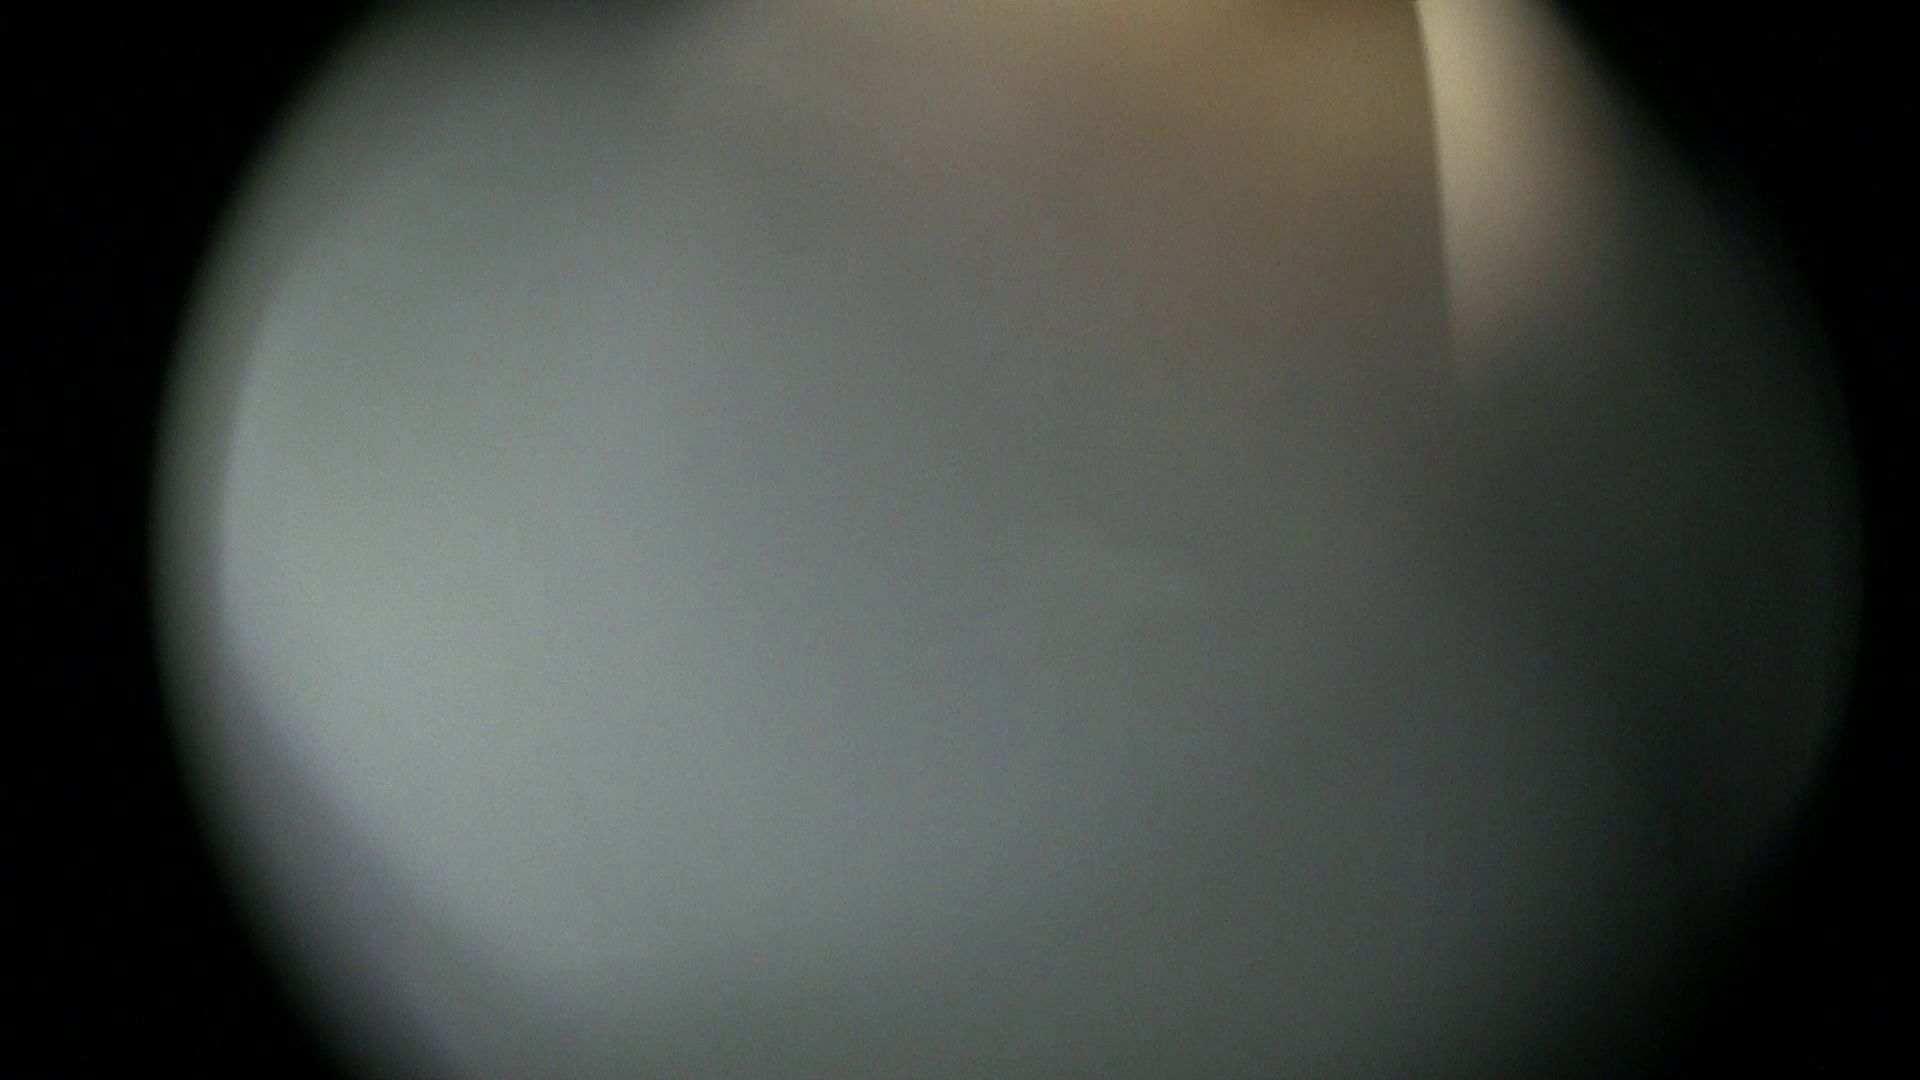 NO.35 勃起力の高い乳首を持つ年増 ギャルの乳首 スケベ動画紹介 53画像 47